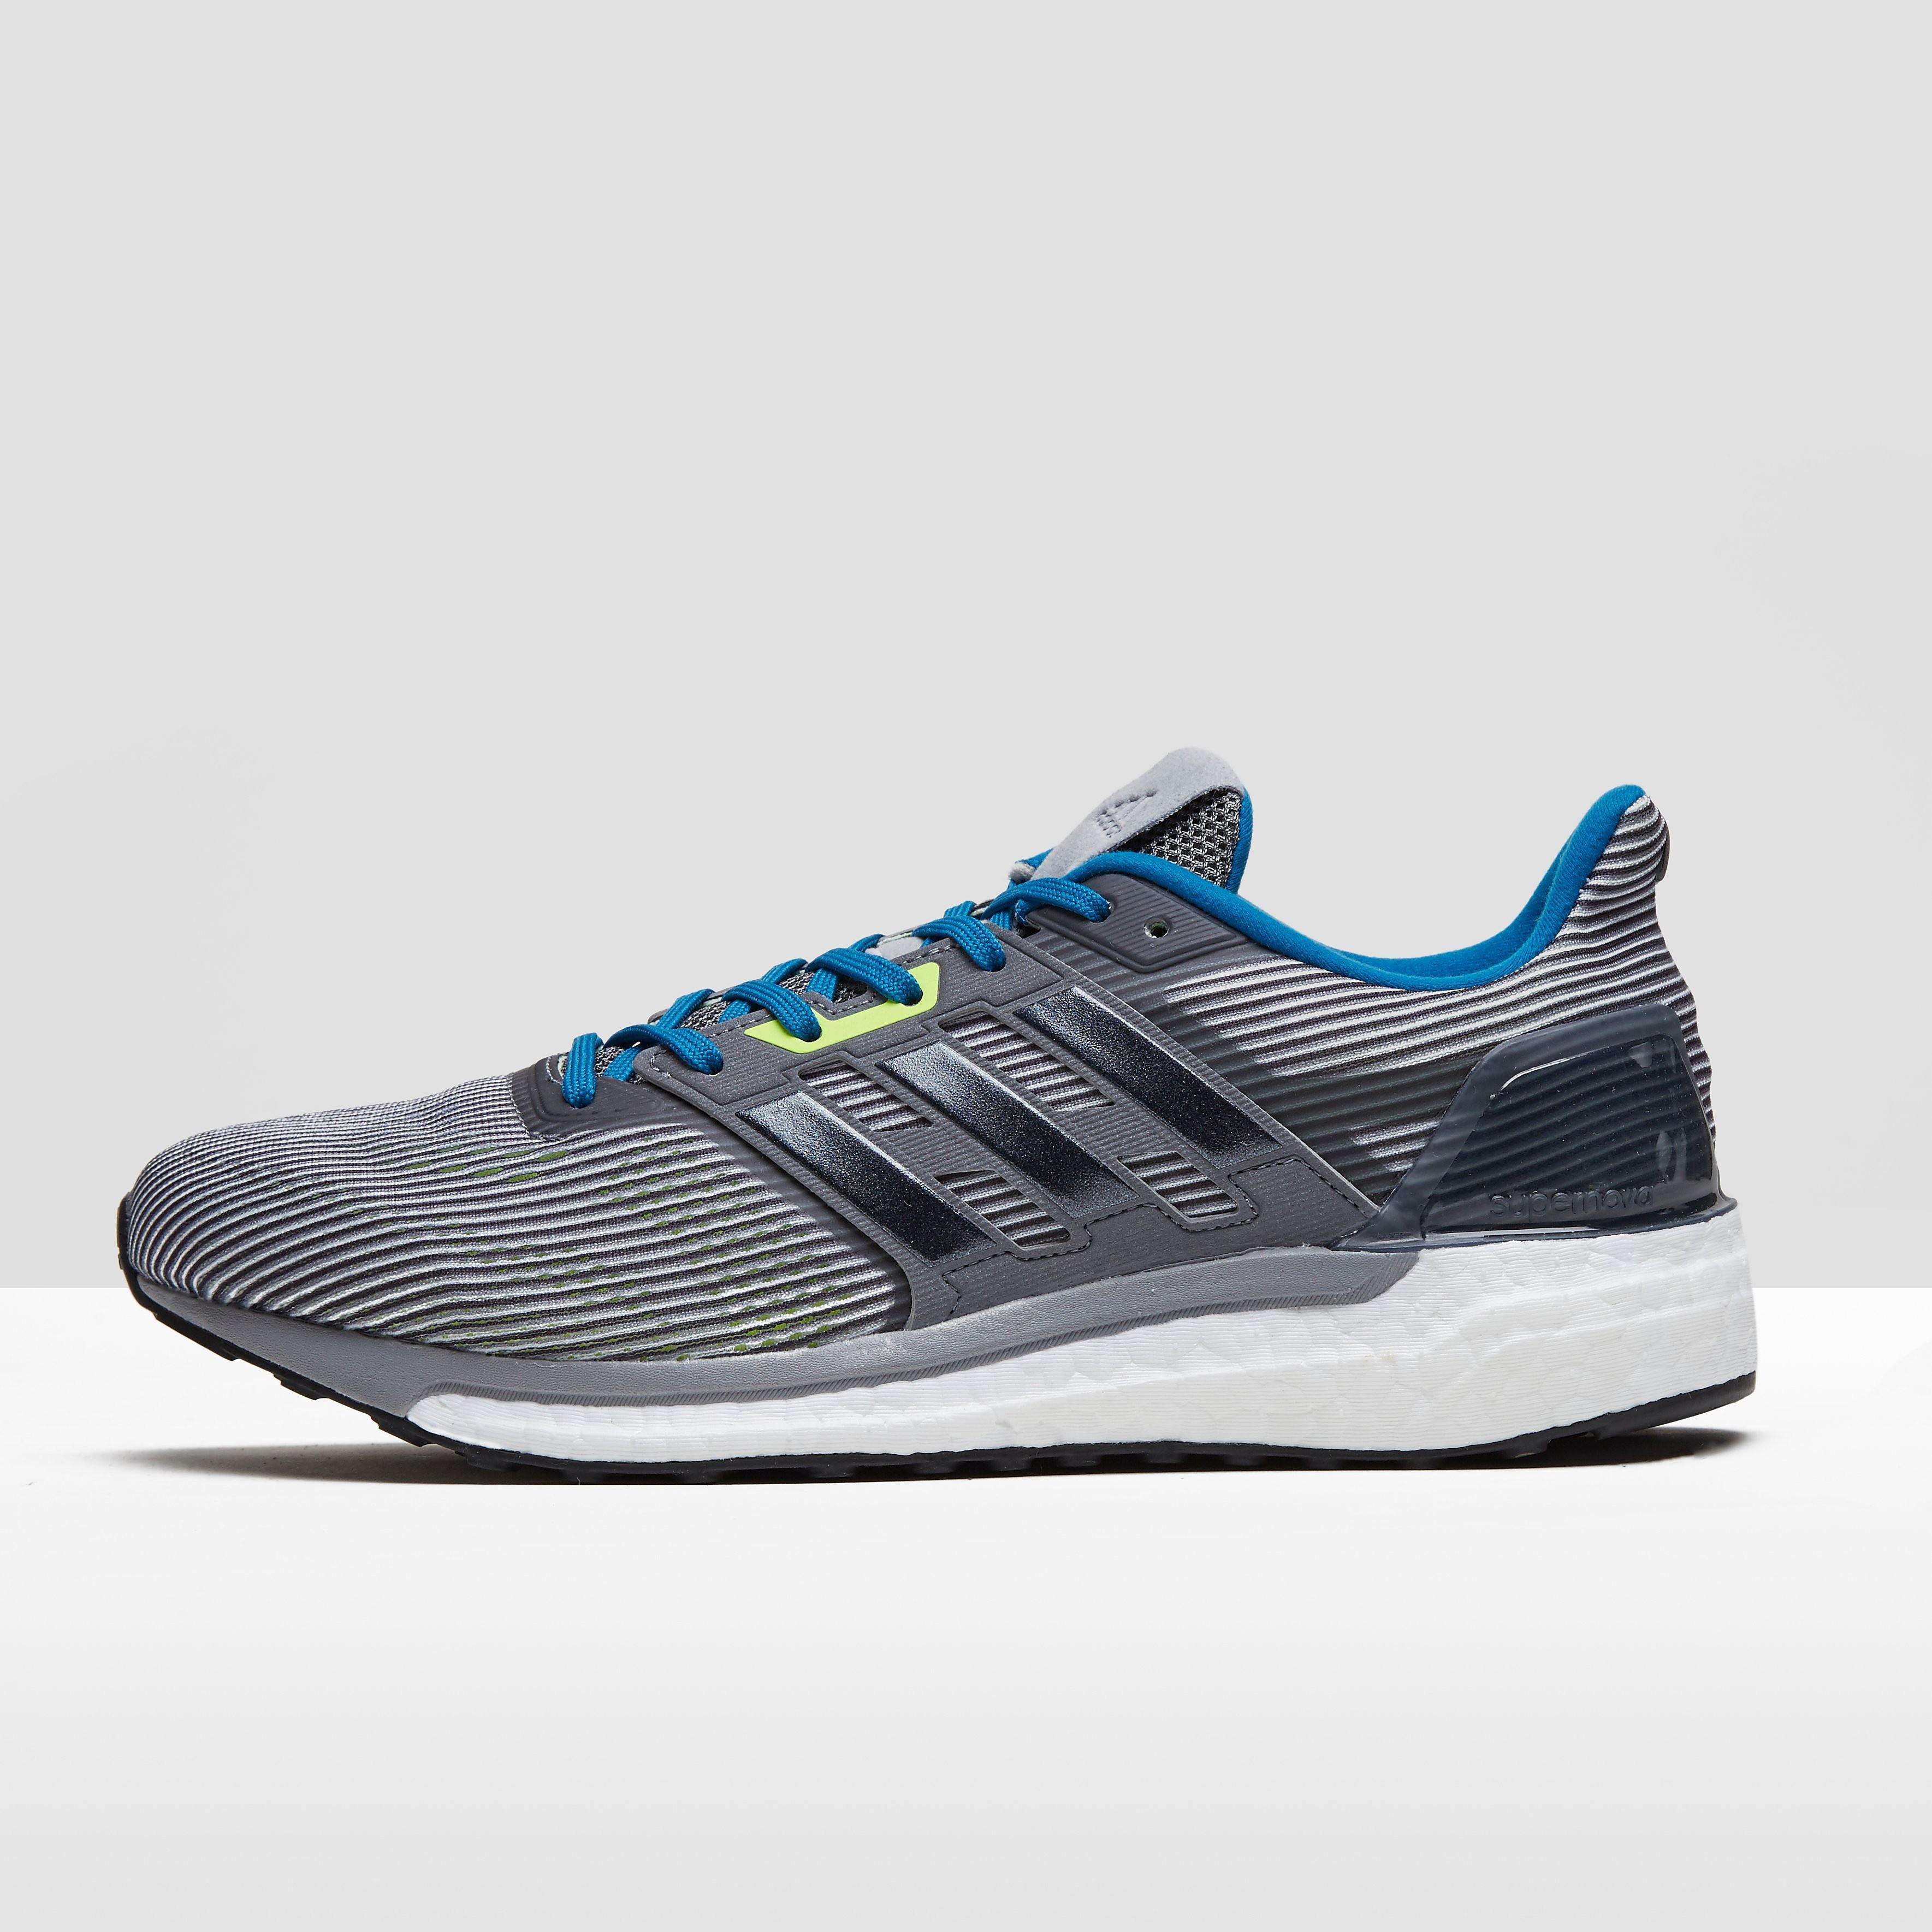 adidas Men's Supernova Running Shoes Vista Grey US 9.5-UK 9